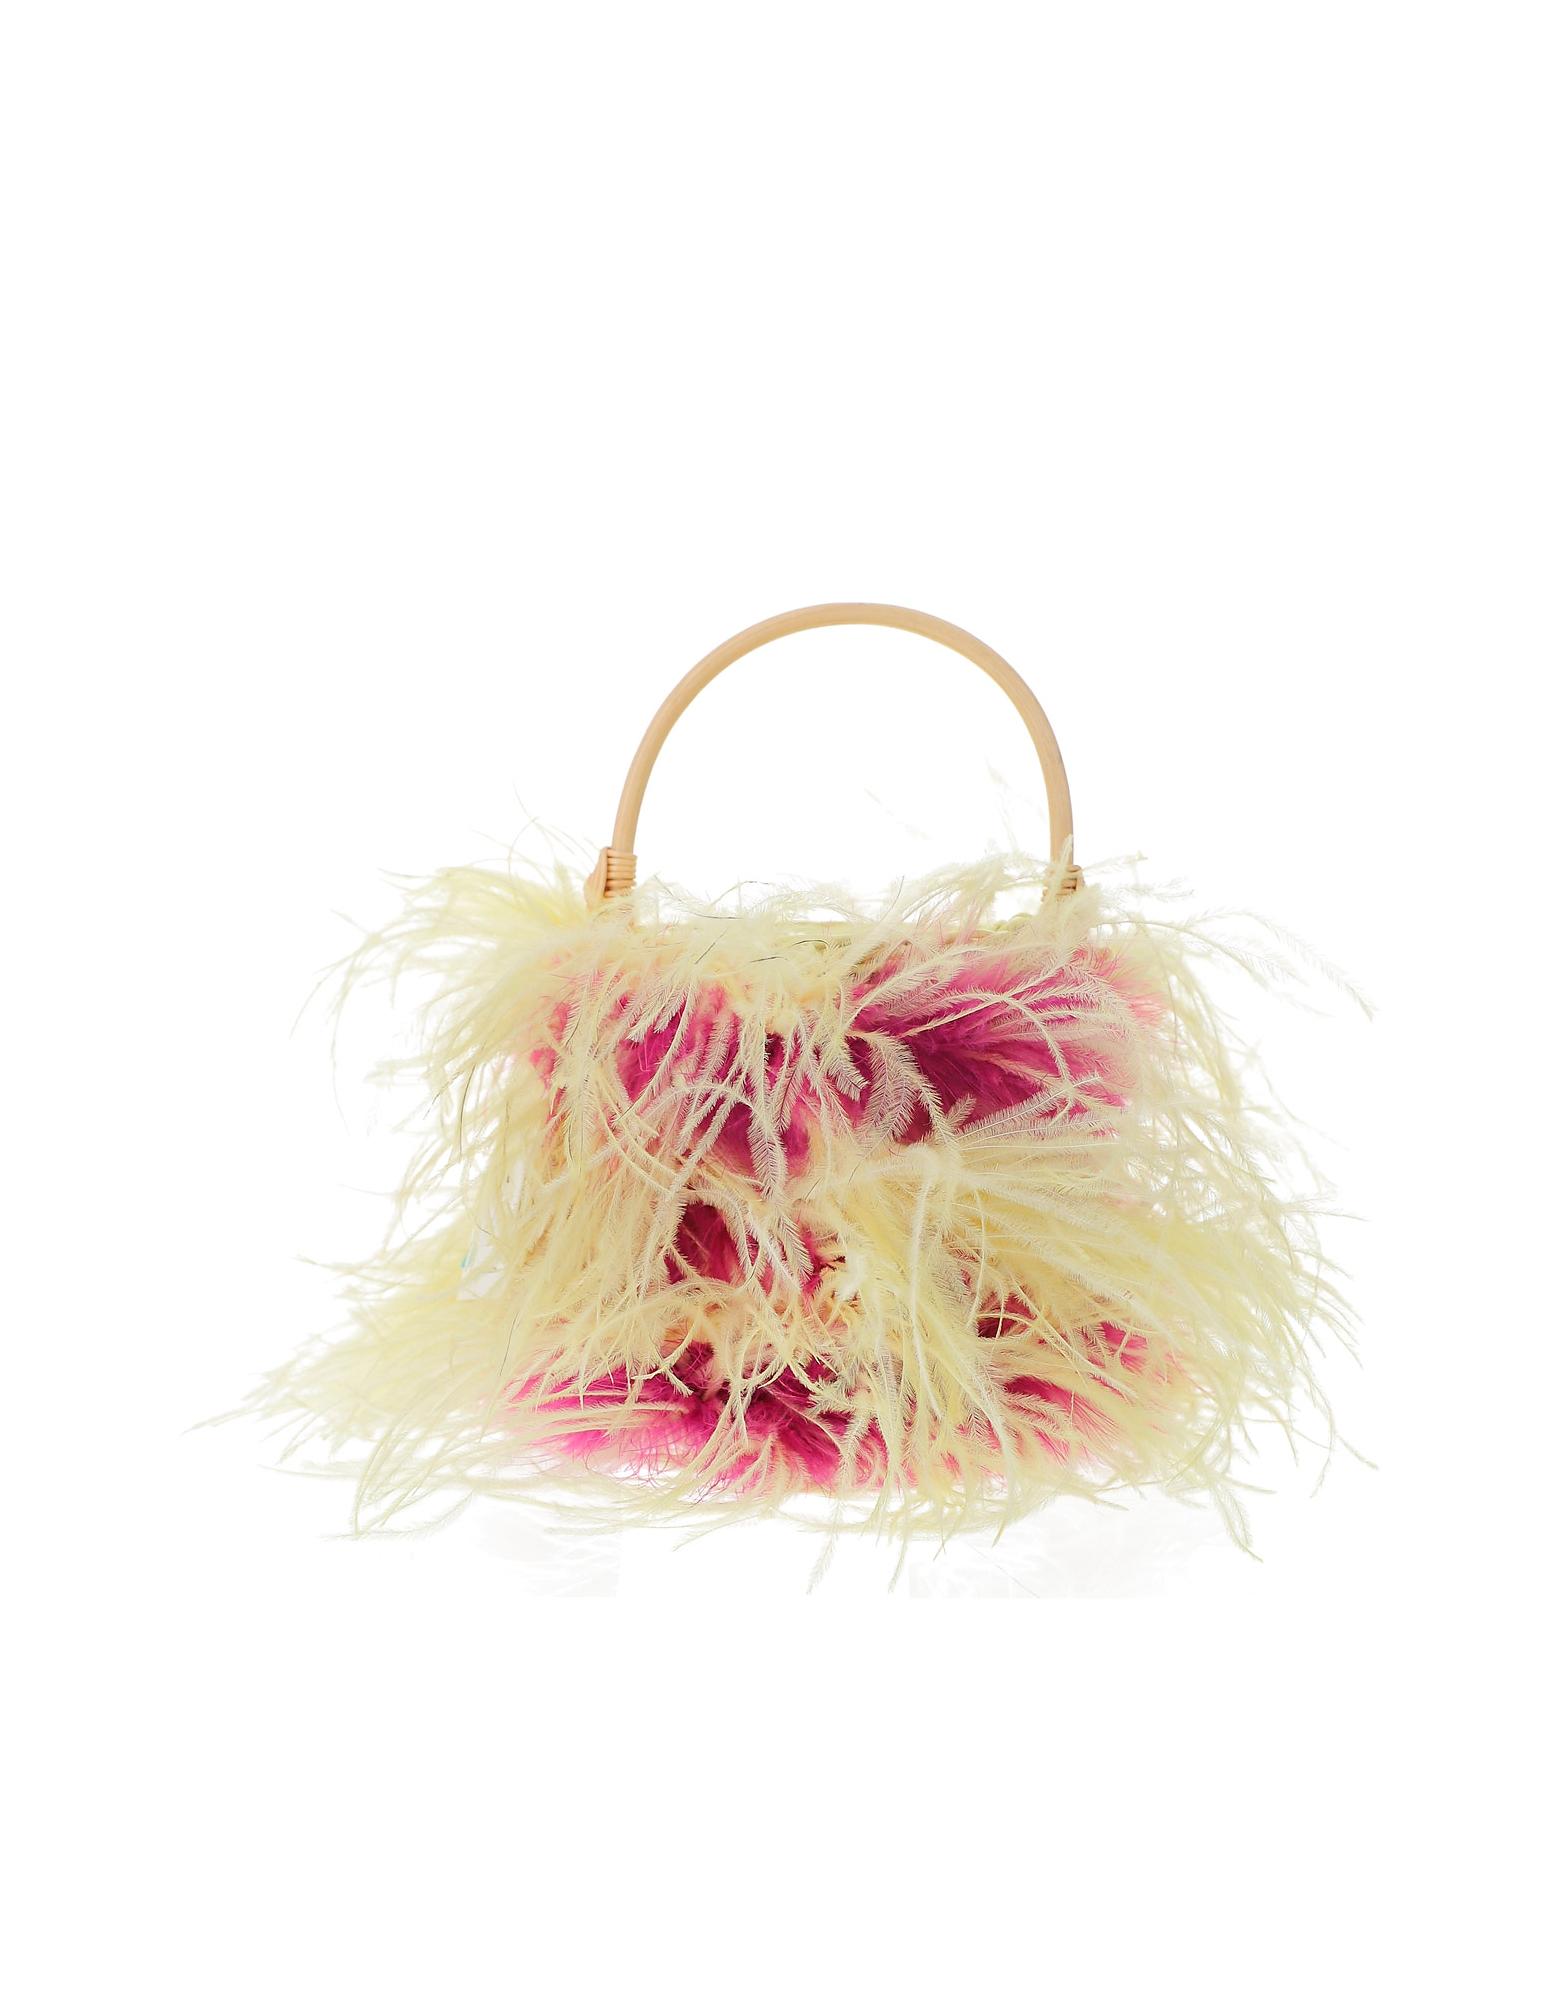 Gatti Designer Handbags, Fuchsia and Pale Yellow Tweety Bag